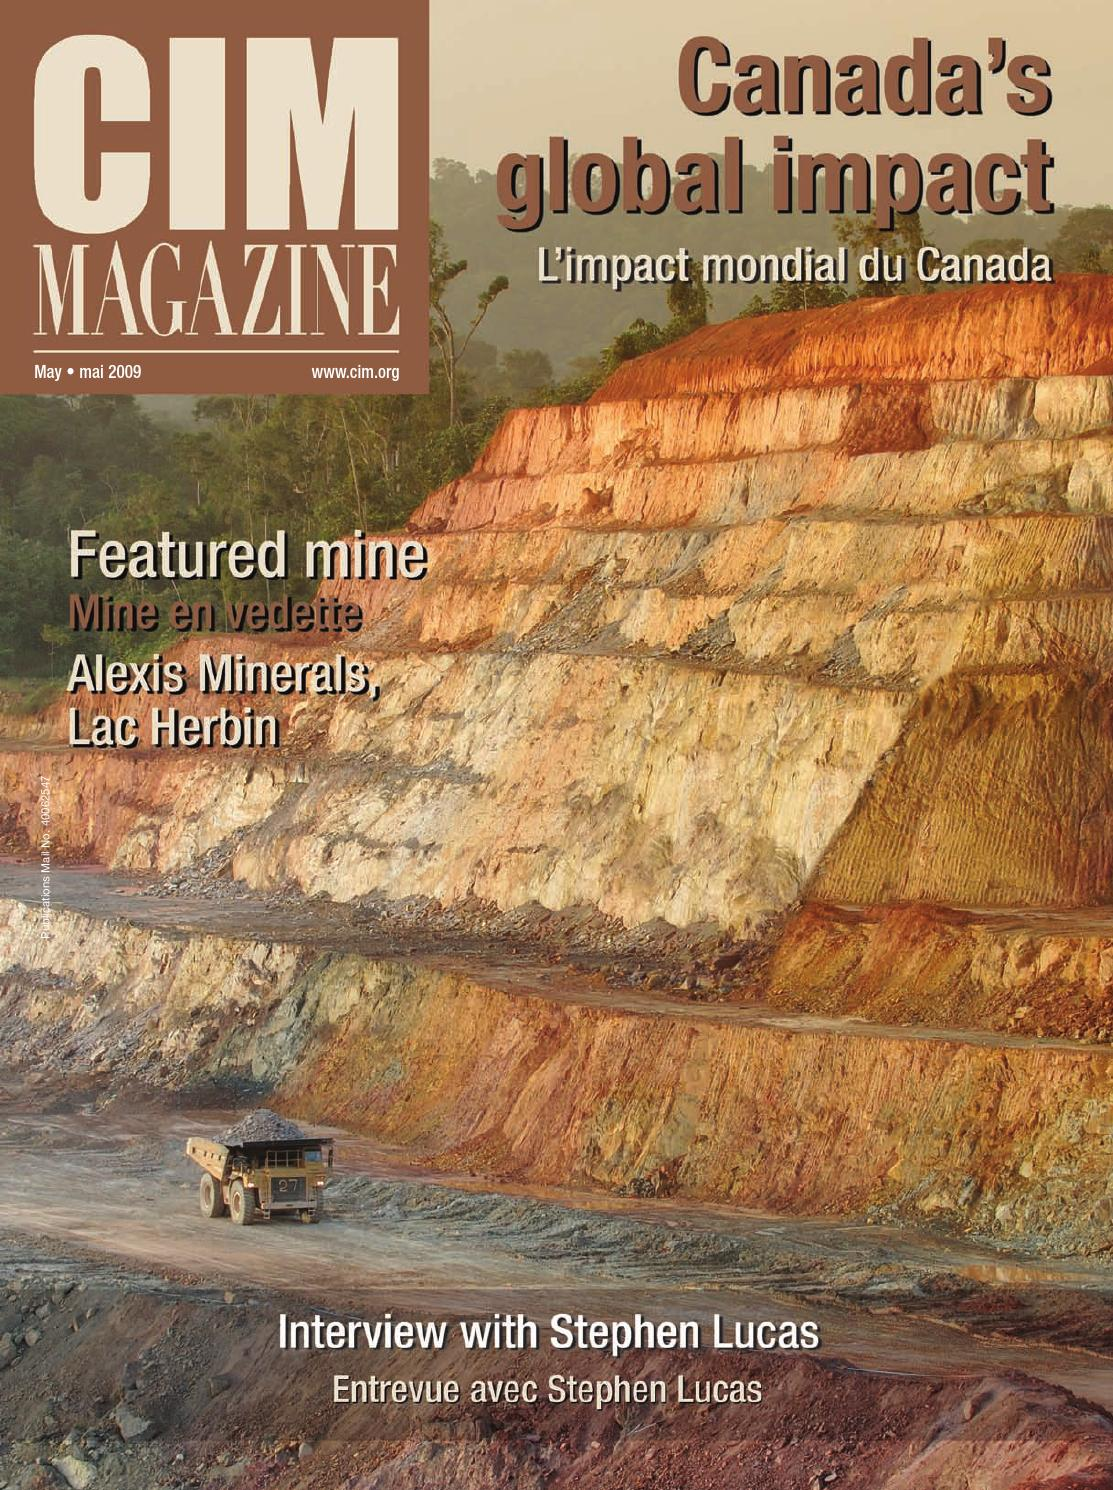 Cim Magazine May 2009 By Cim Icm Publications Issuu